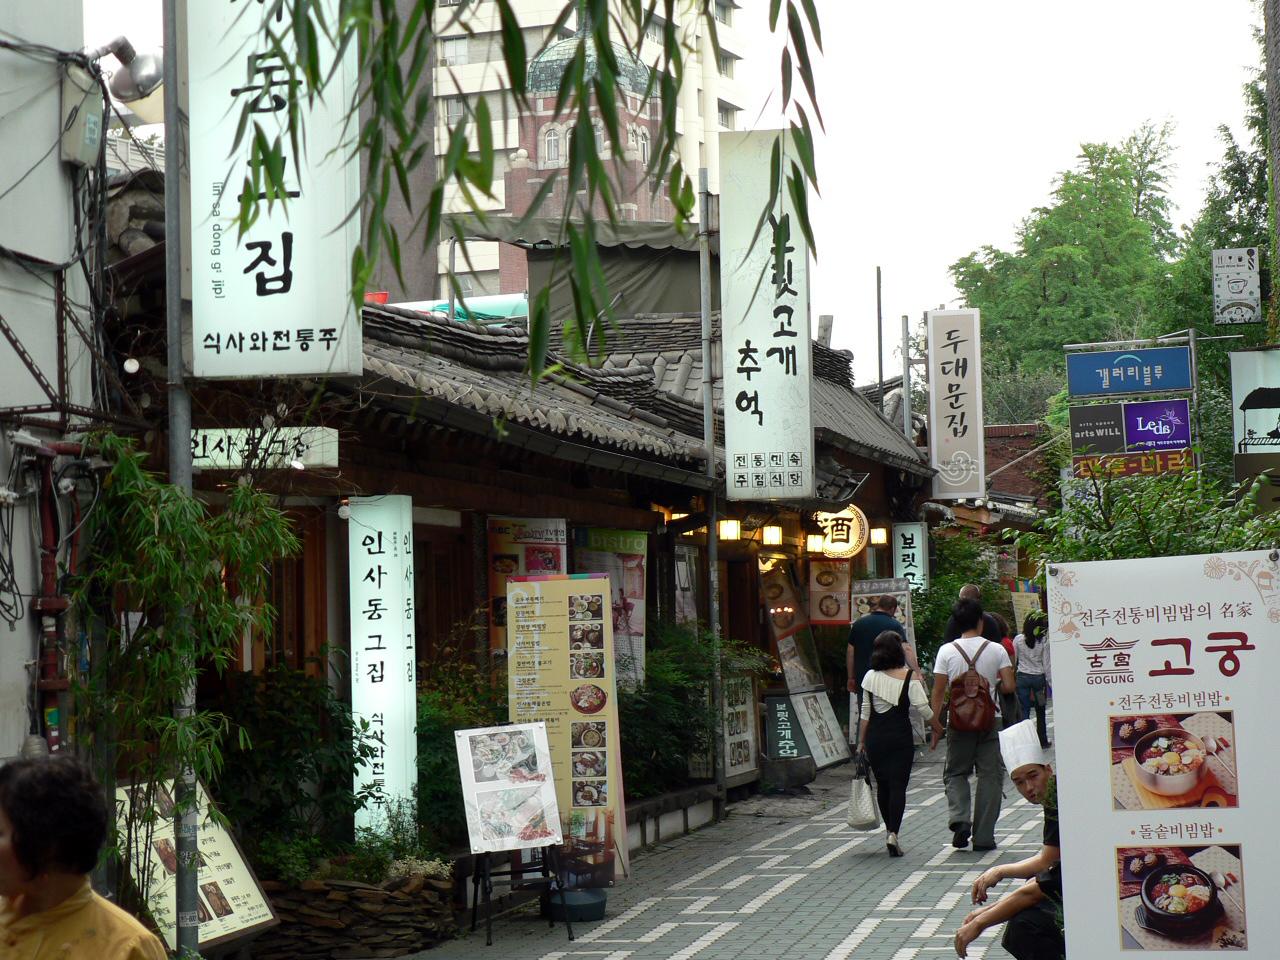 South Korean Street Wear Fashion